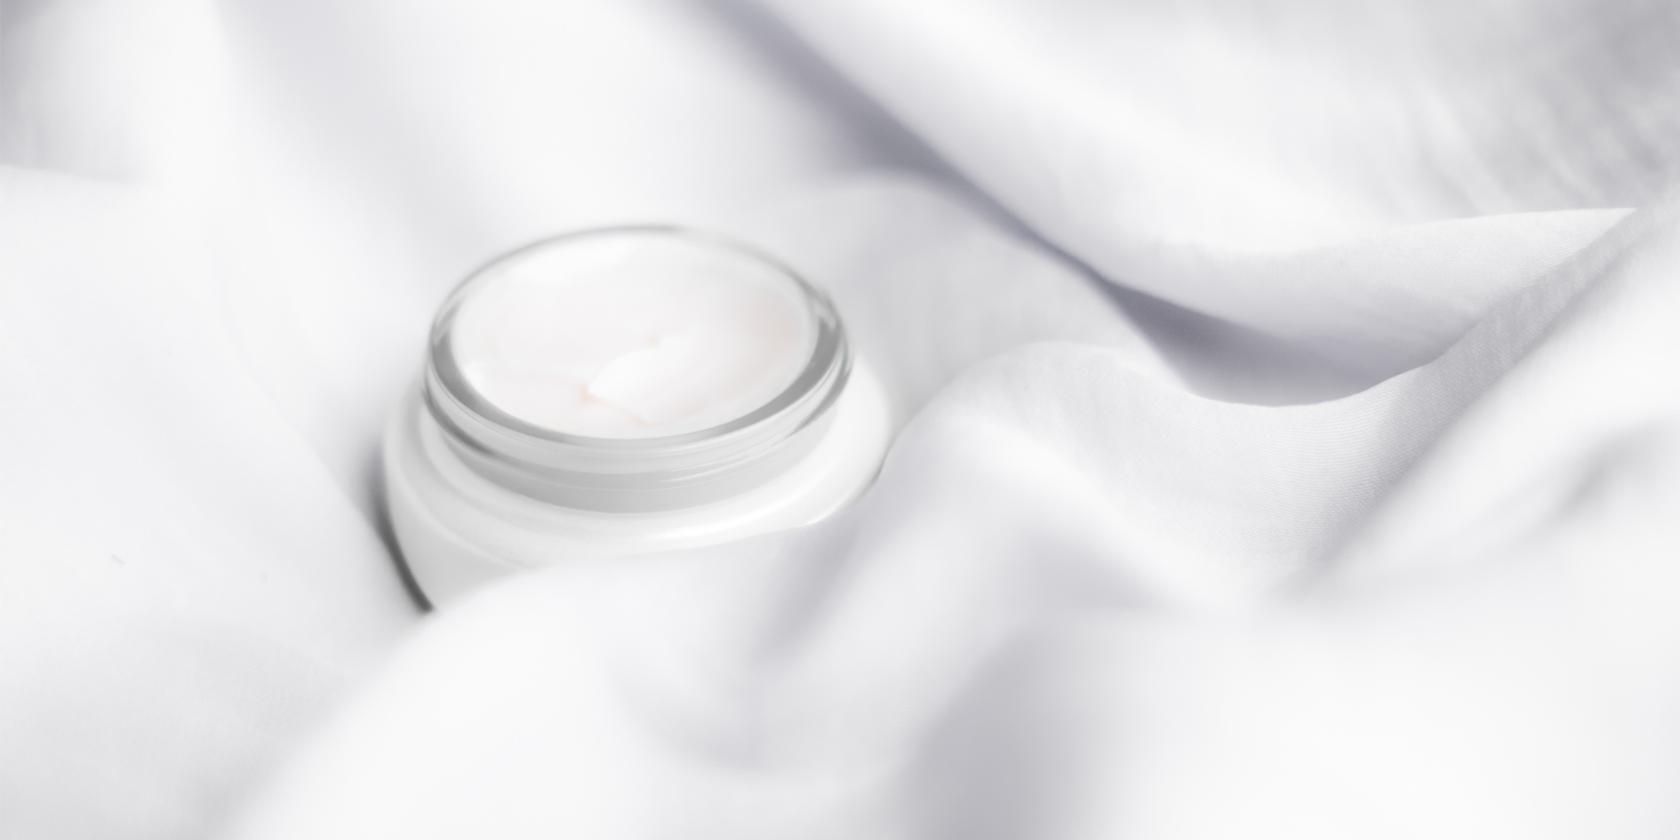 minimalismus kosmetik hautpflege